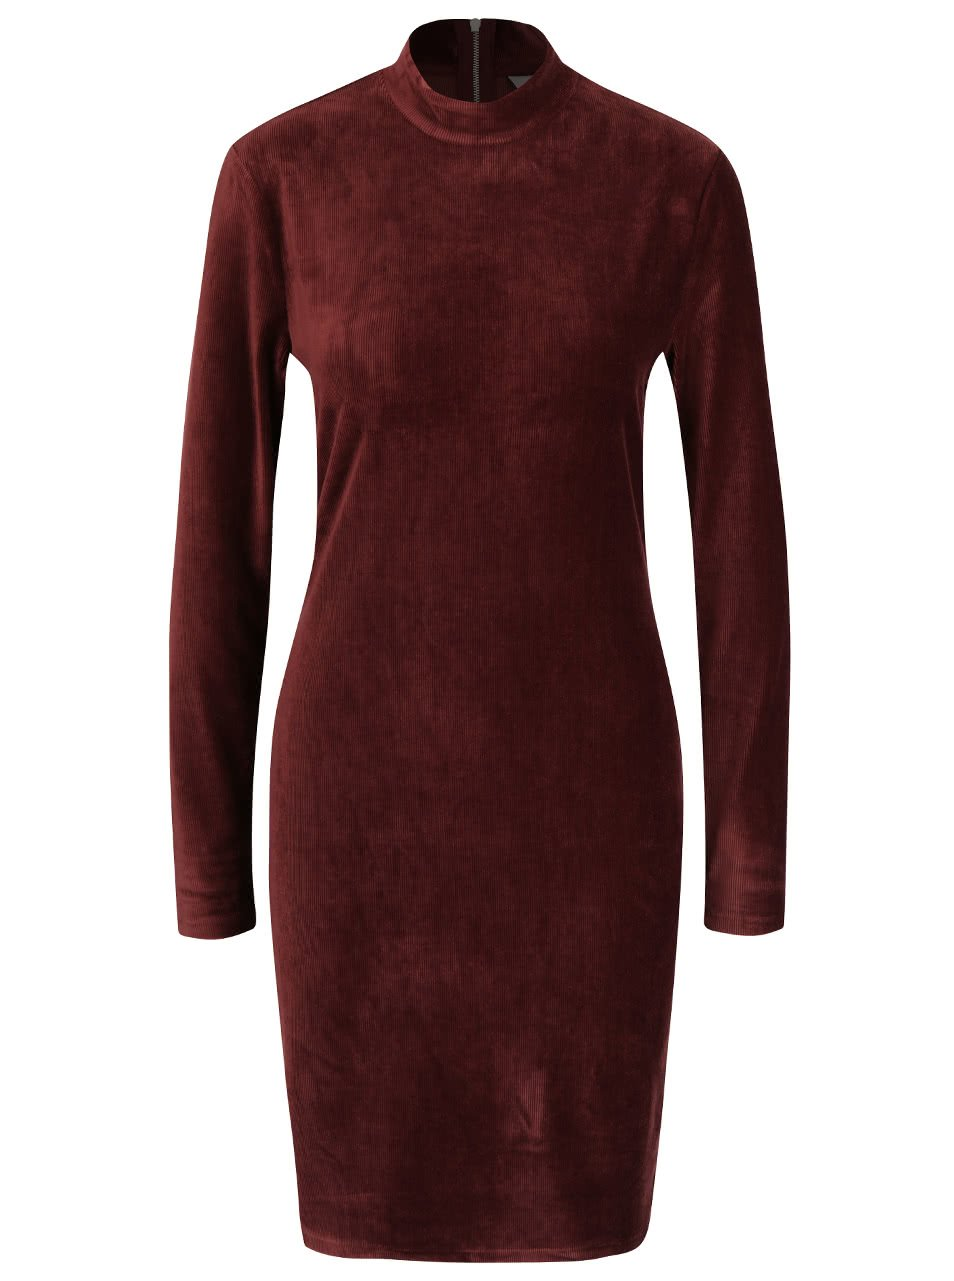 Hnědé sametové šaty ke krku s dlouhým rukávem Vero Moda Corduroy